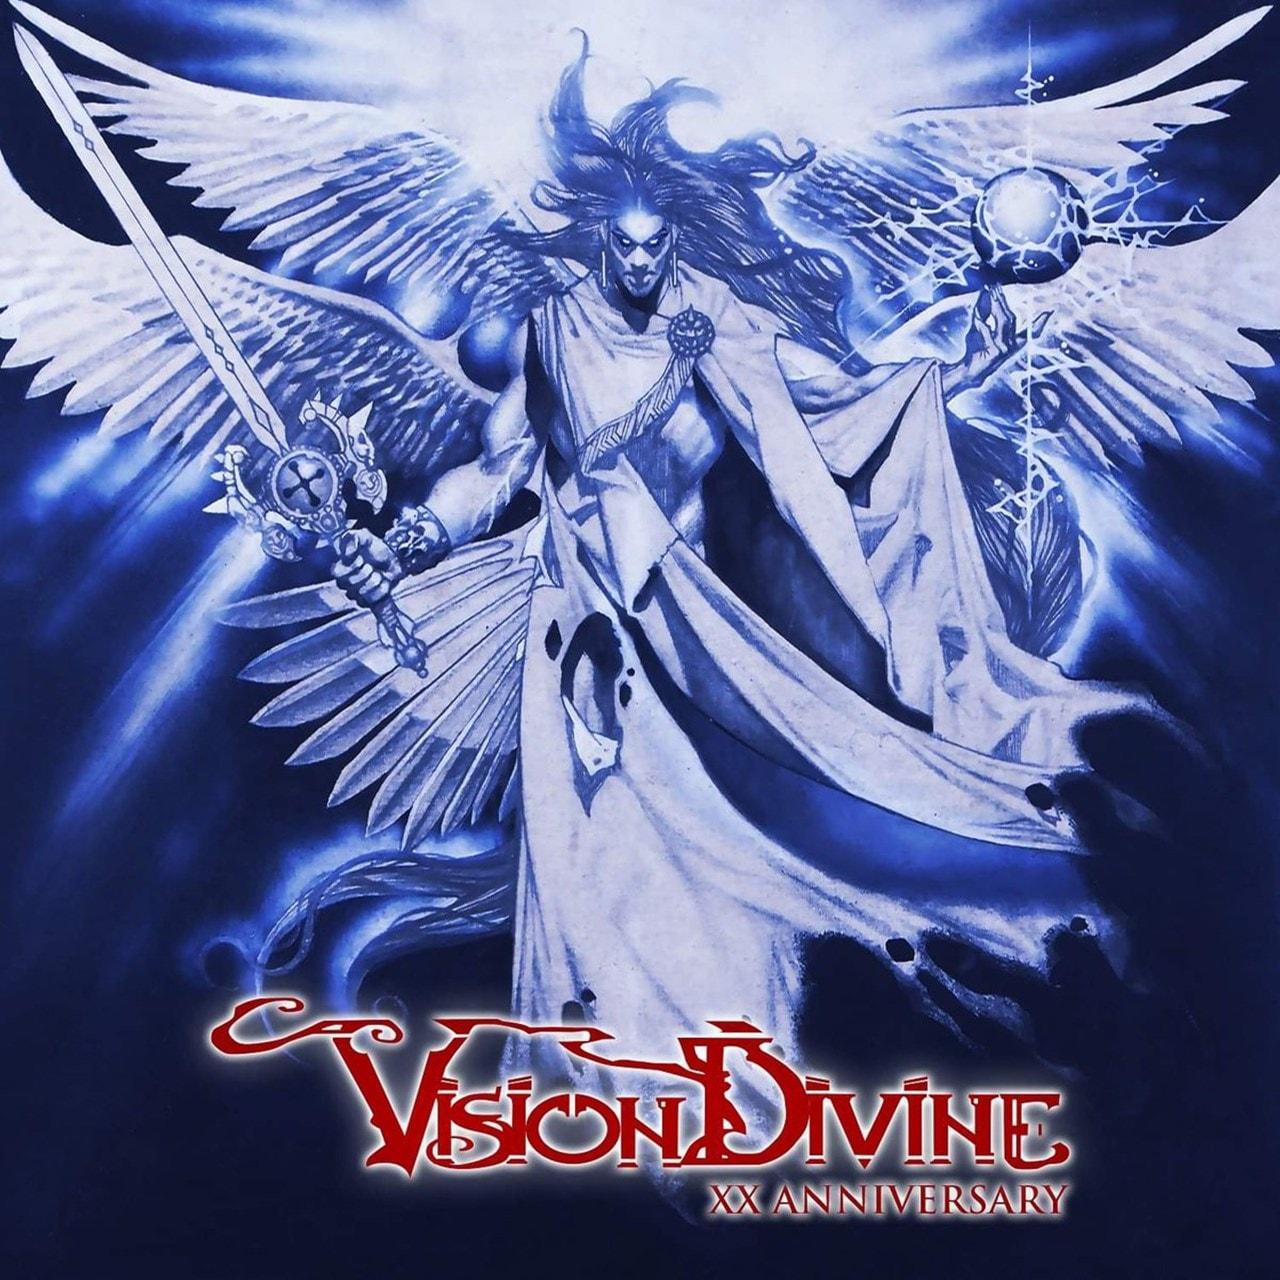 Vision Divine: XX Anniversary - 1